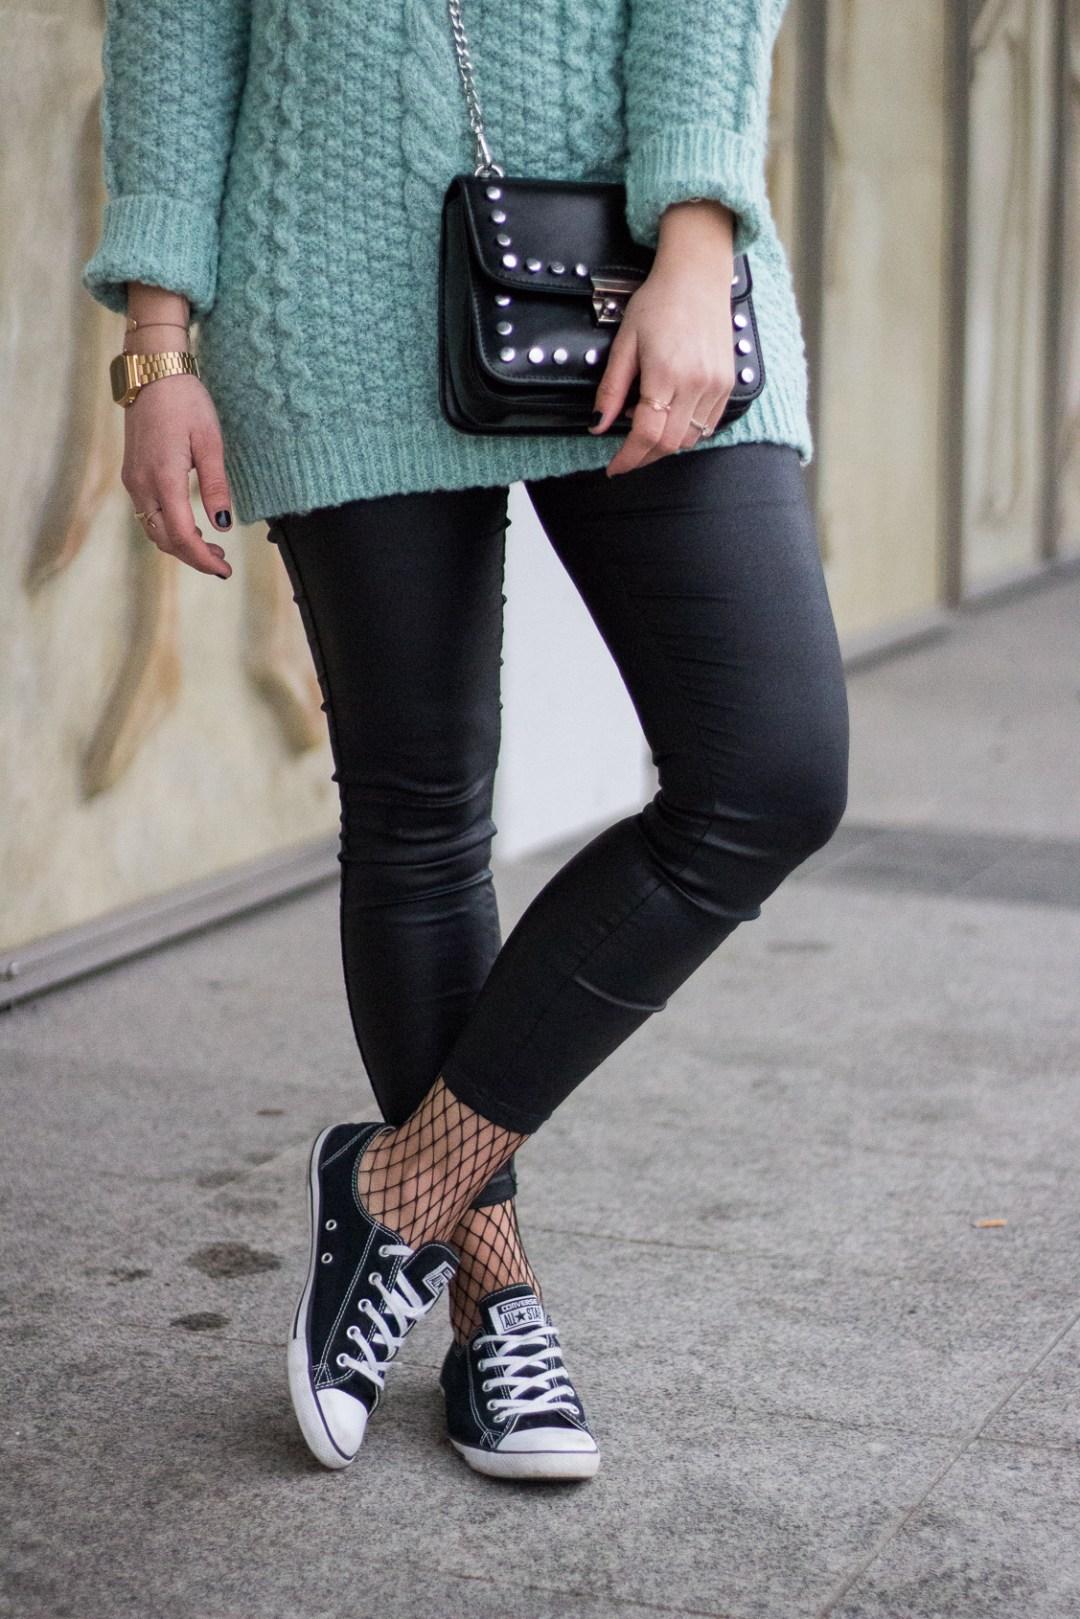 basiclook, lederhose, converse, strickpullover, flechtfrisur, fashionblogger, streetstyle, lakatyfox-3